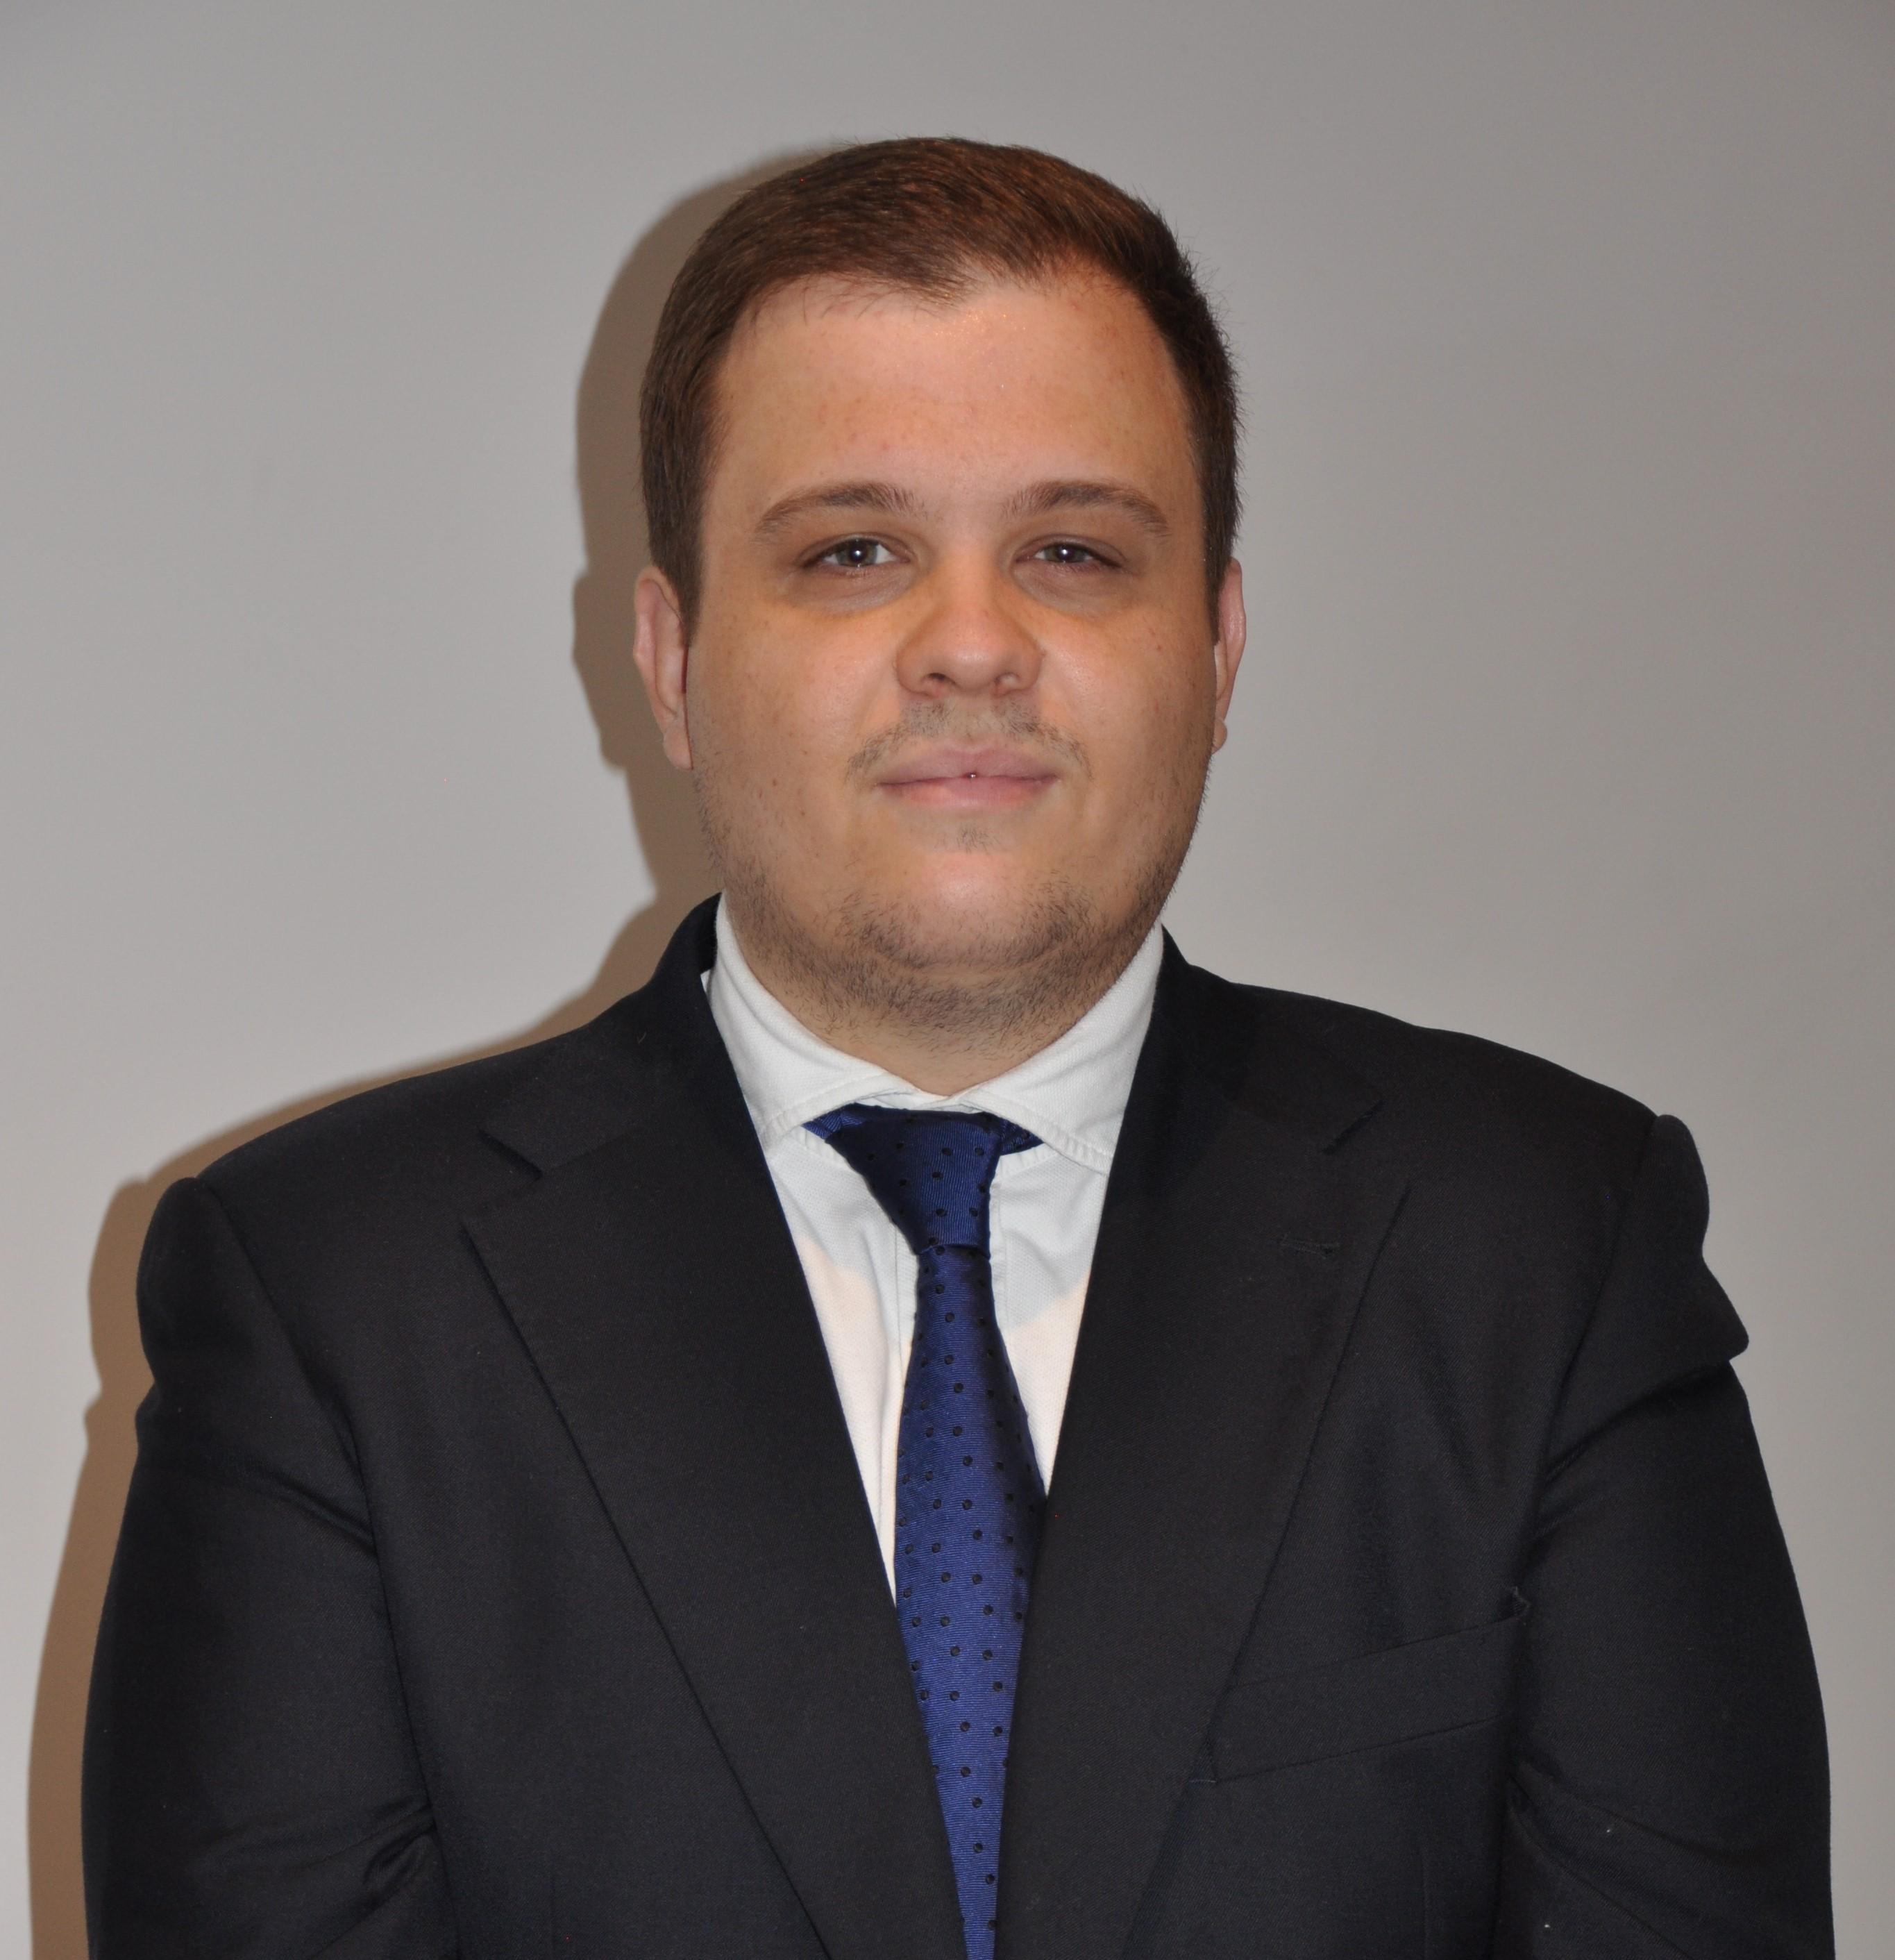 Alejandro Blanco Bonet